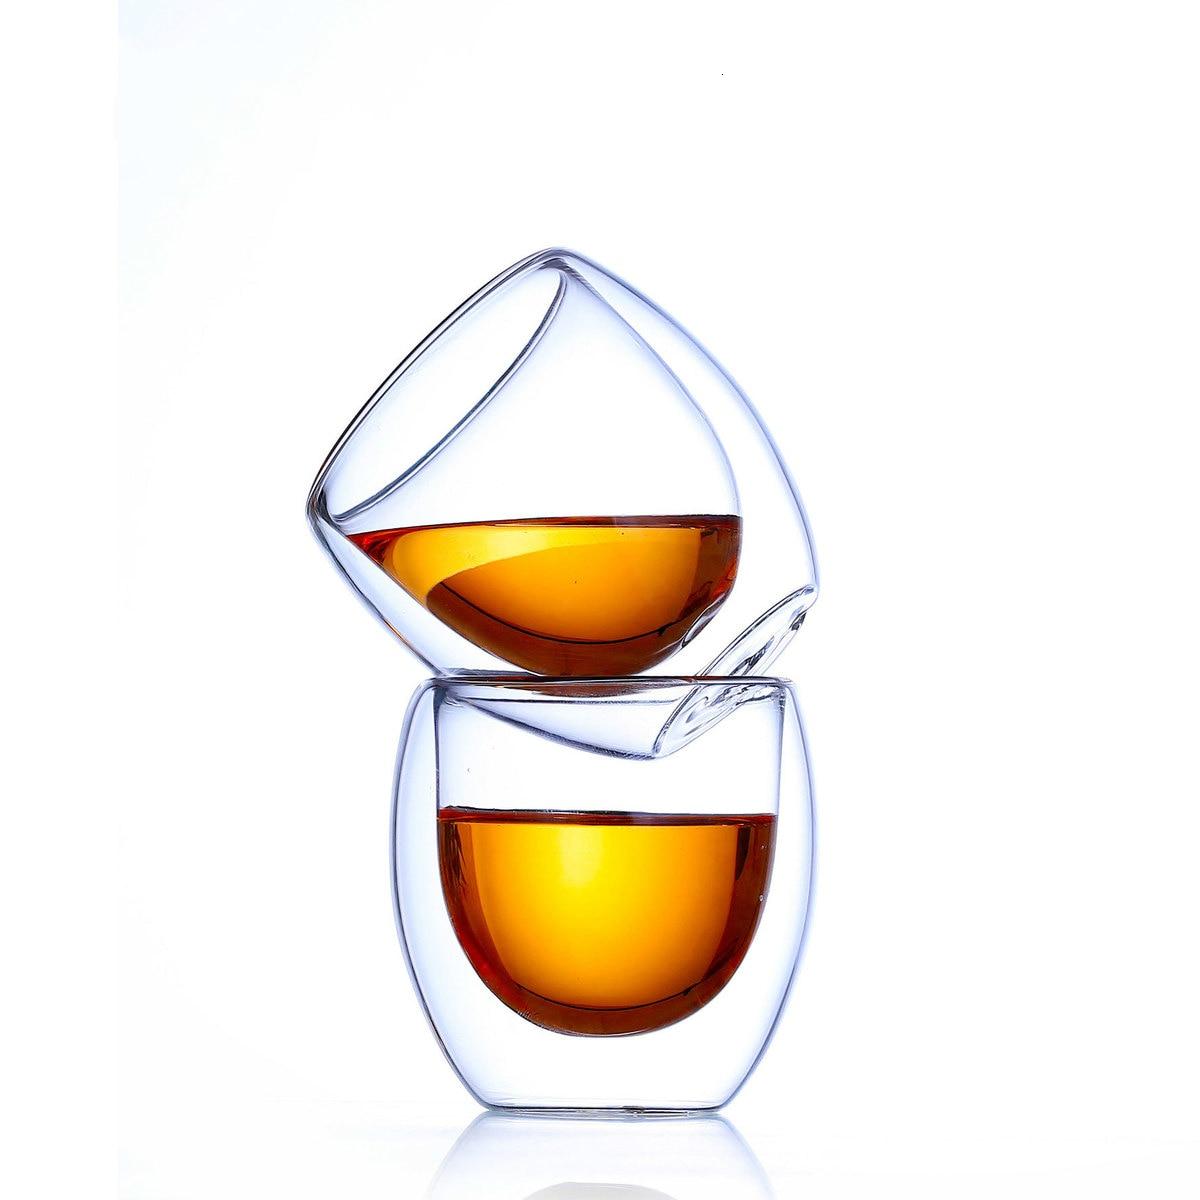 6 piezas Bodum forma de huevo doble pared Anti escaldado Mini Kung Fu Puer juego de tazas de té Shot Glass Home Teacup Nespresso vaso